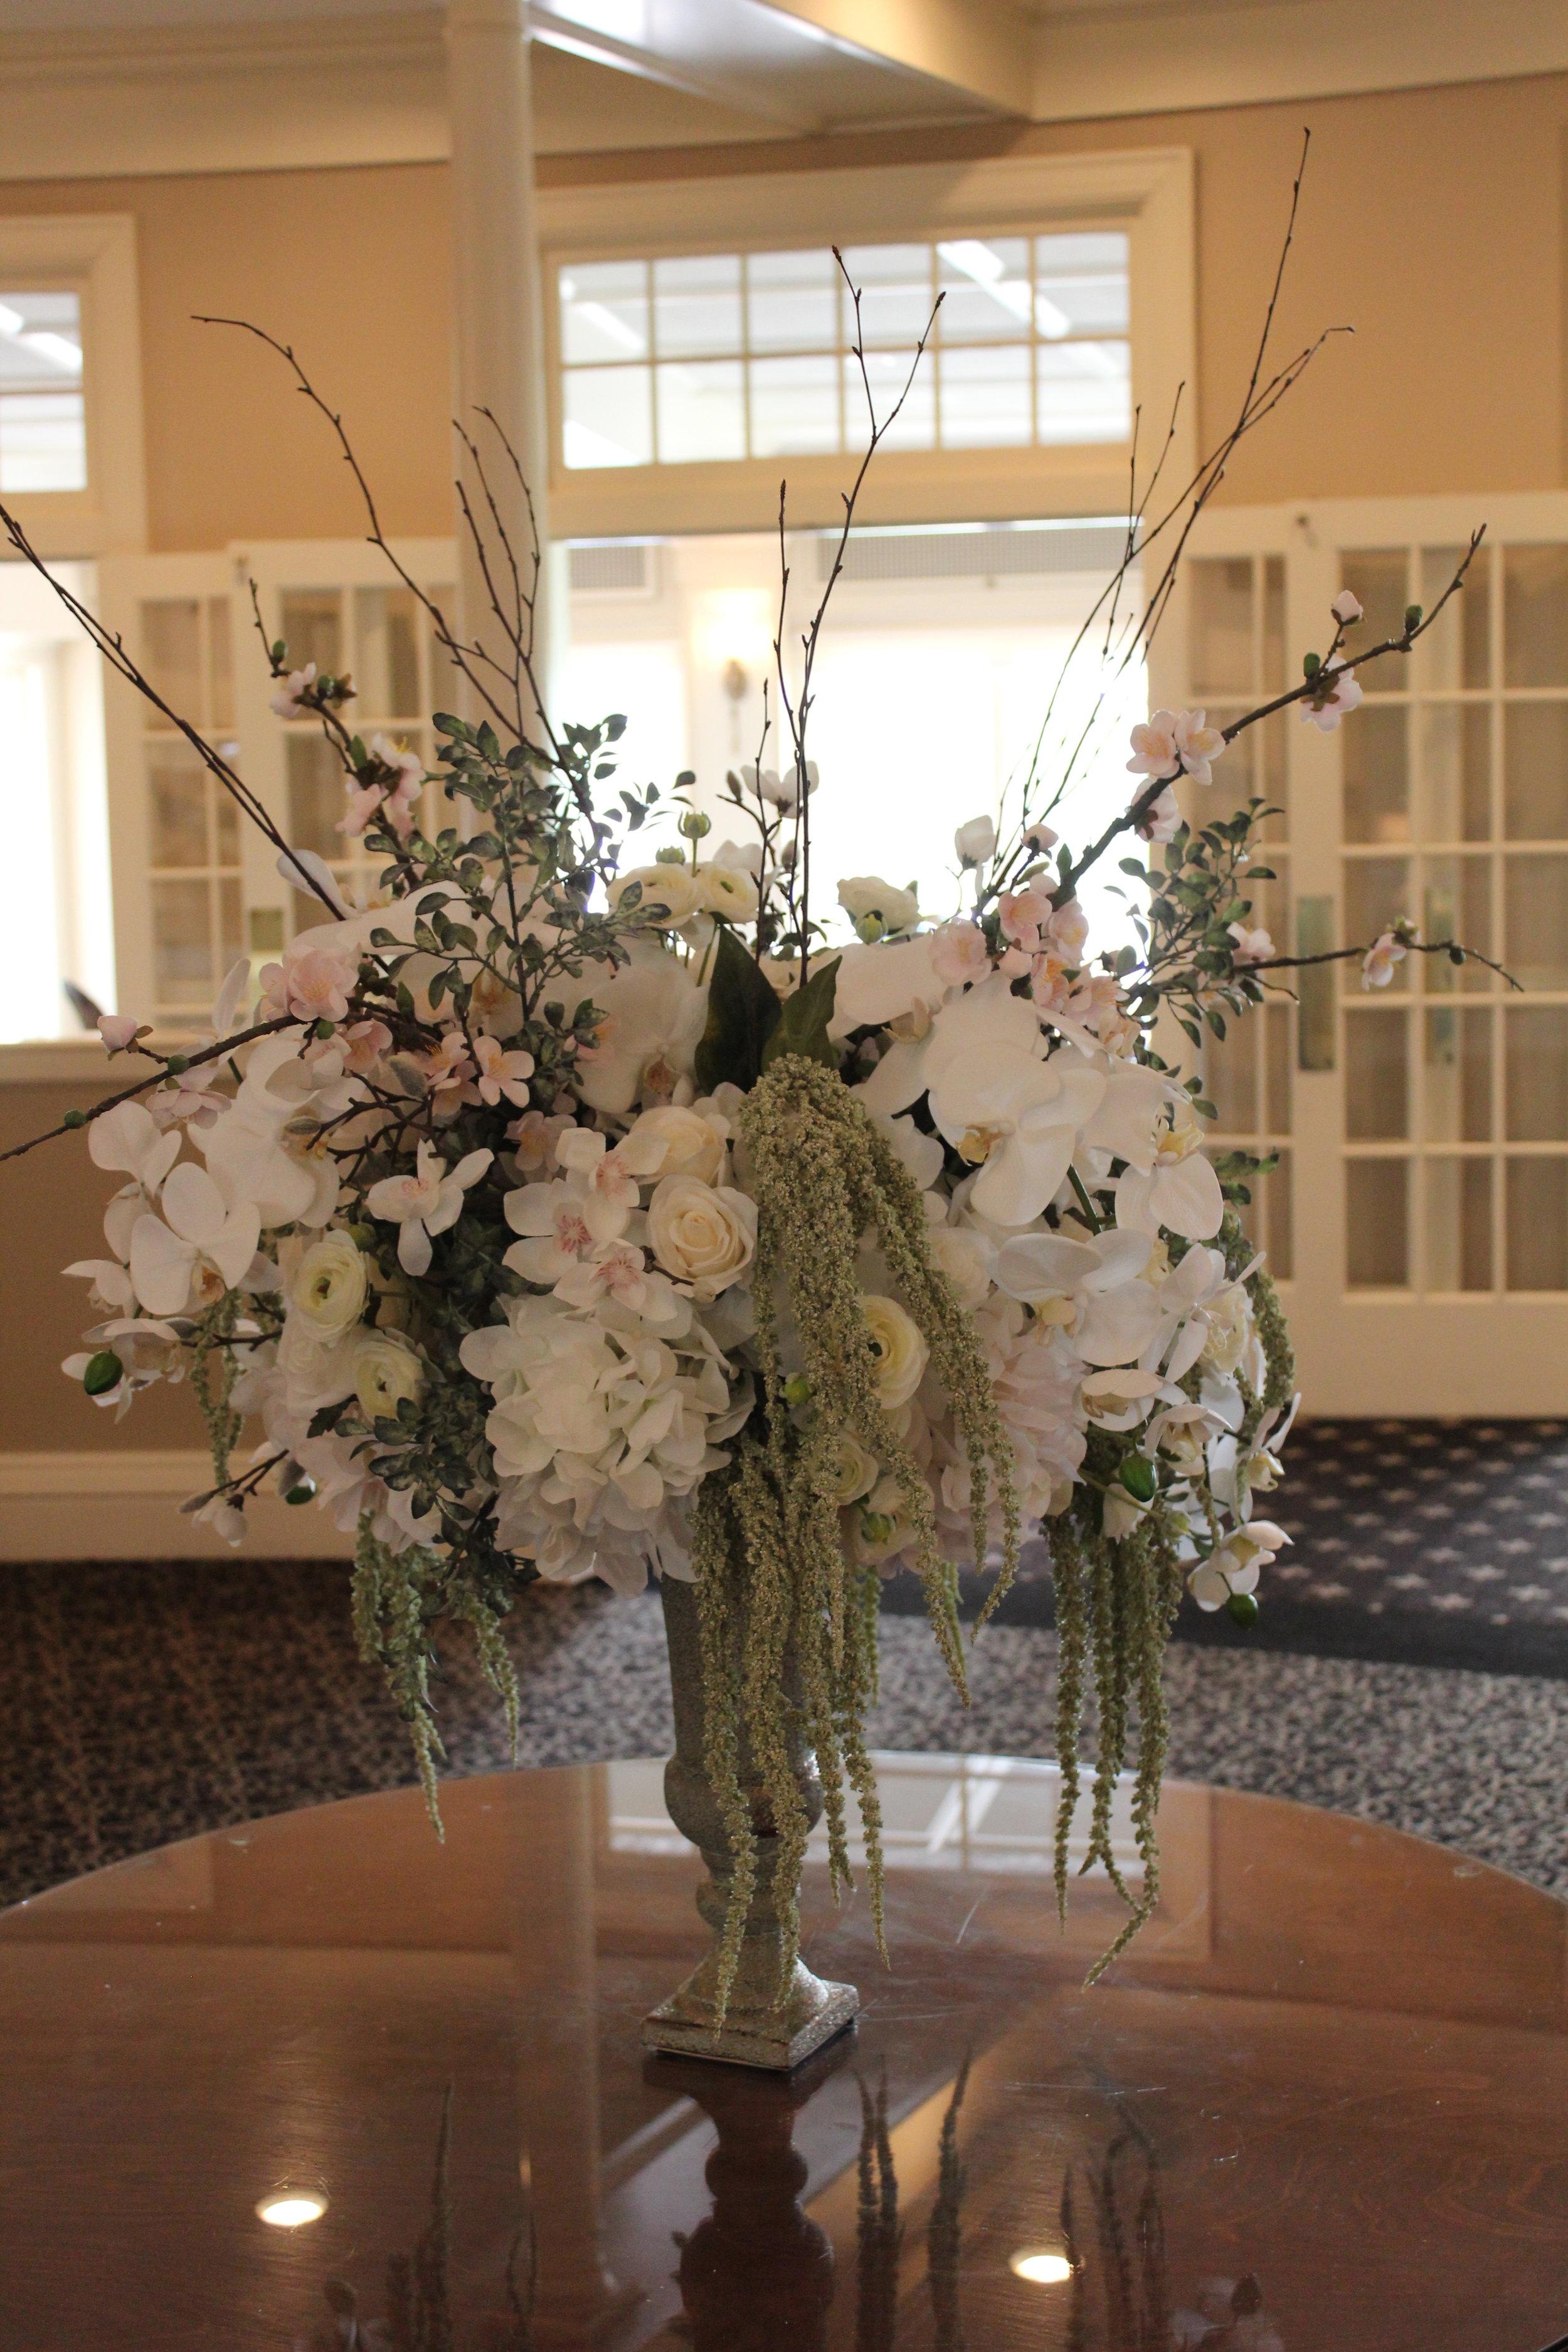 custom-wedding-flowers-silk-centerpiece-bridal-bouquets.jpg